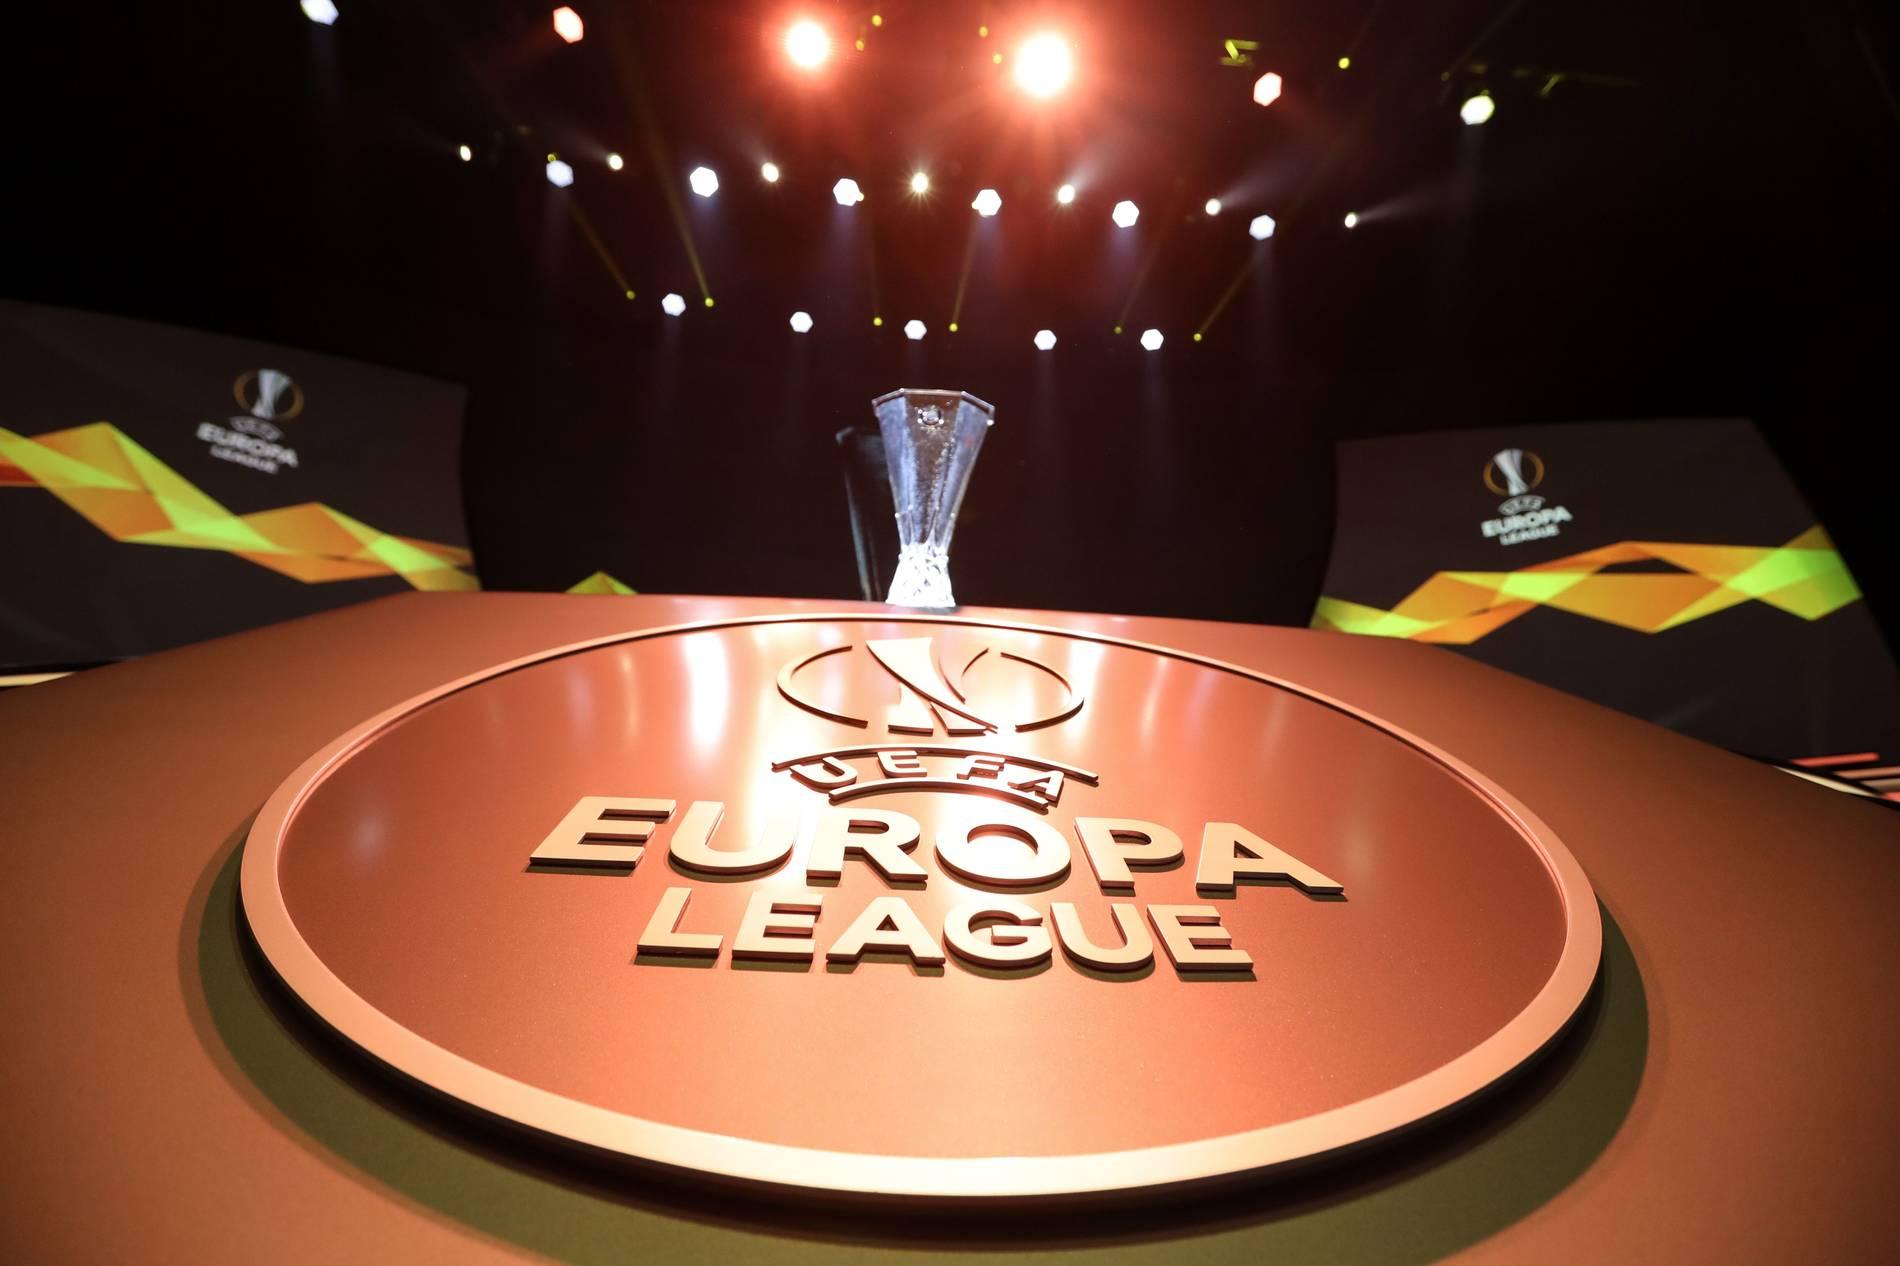 Europa League Auslosung Achtelfinale 2021